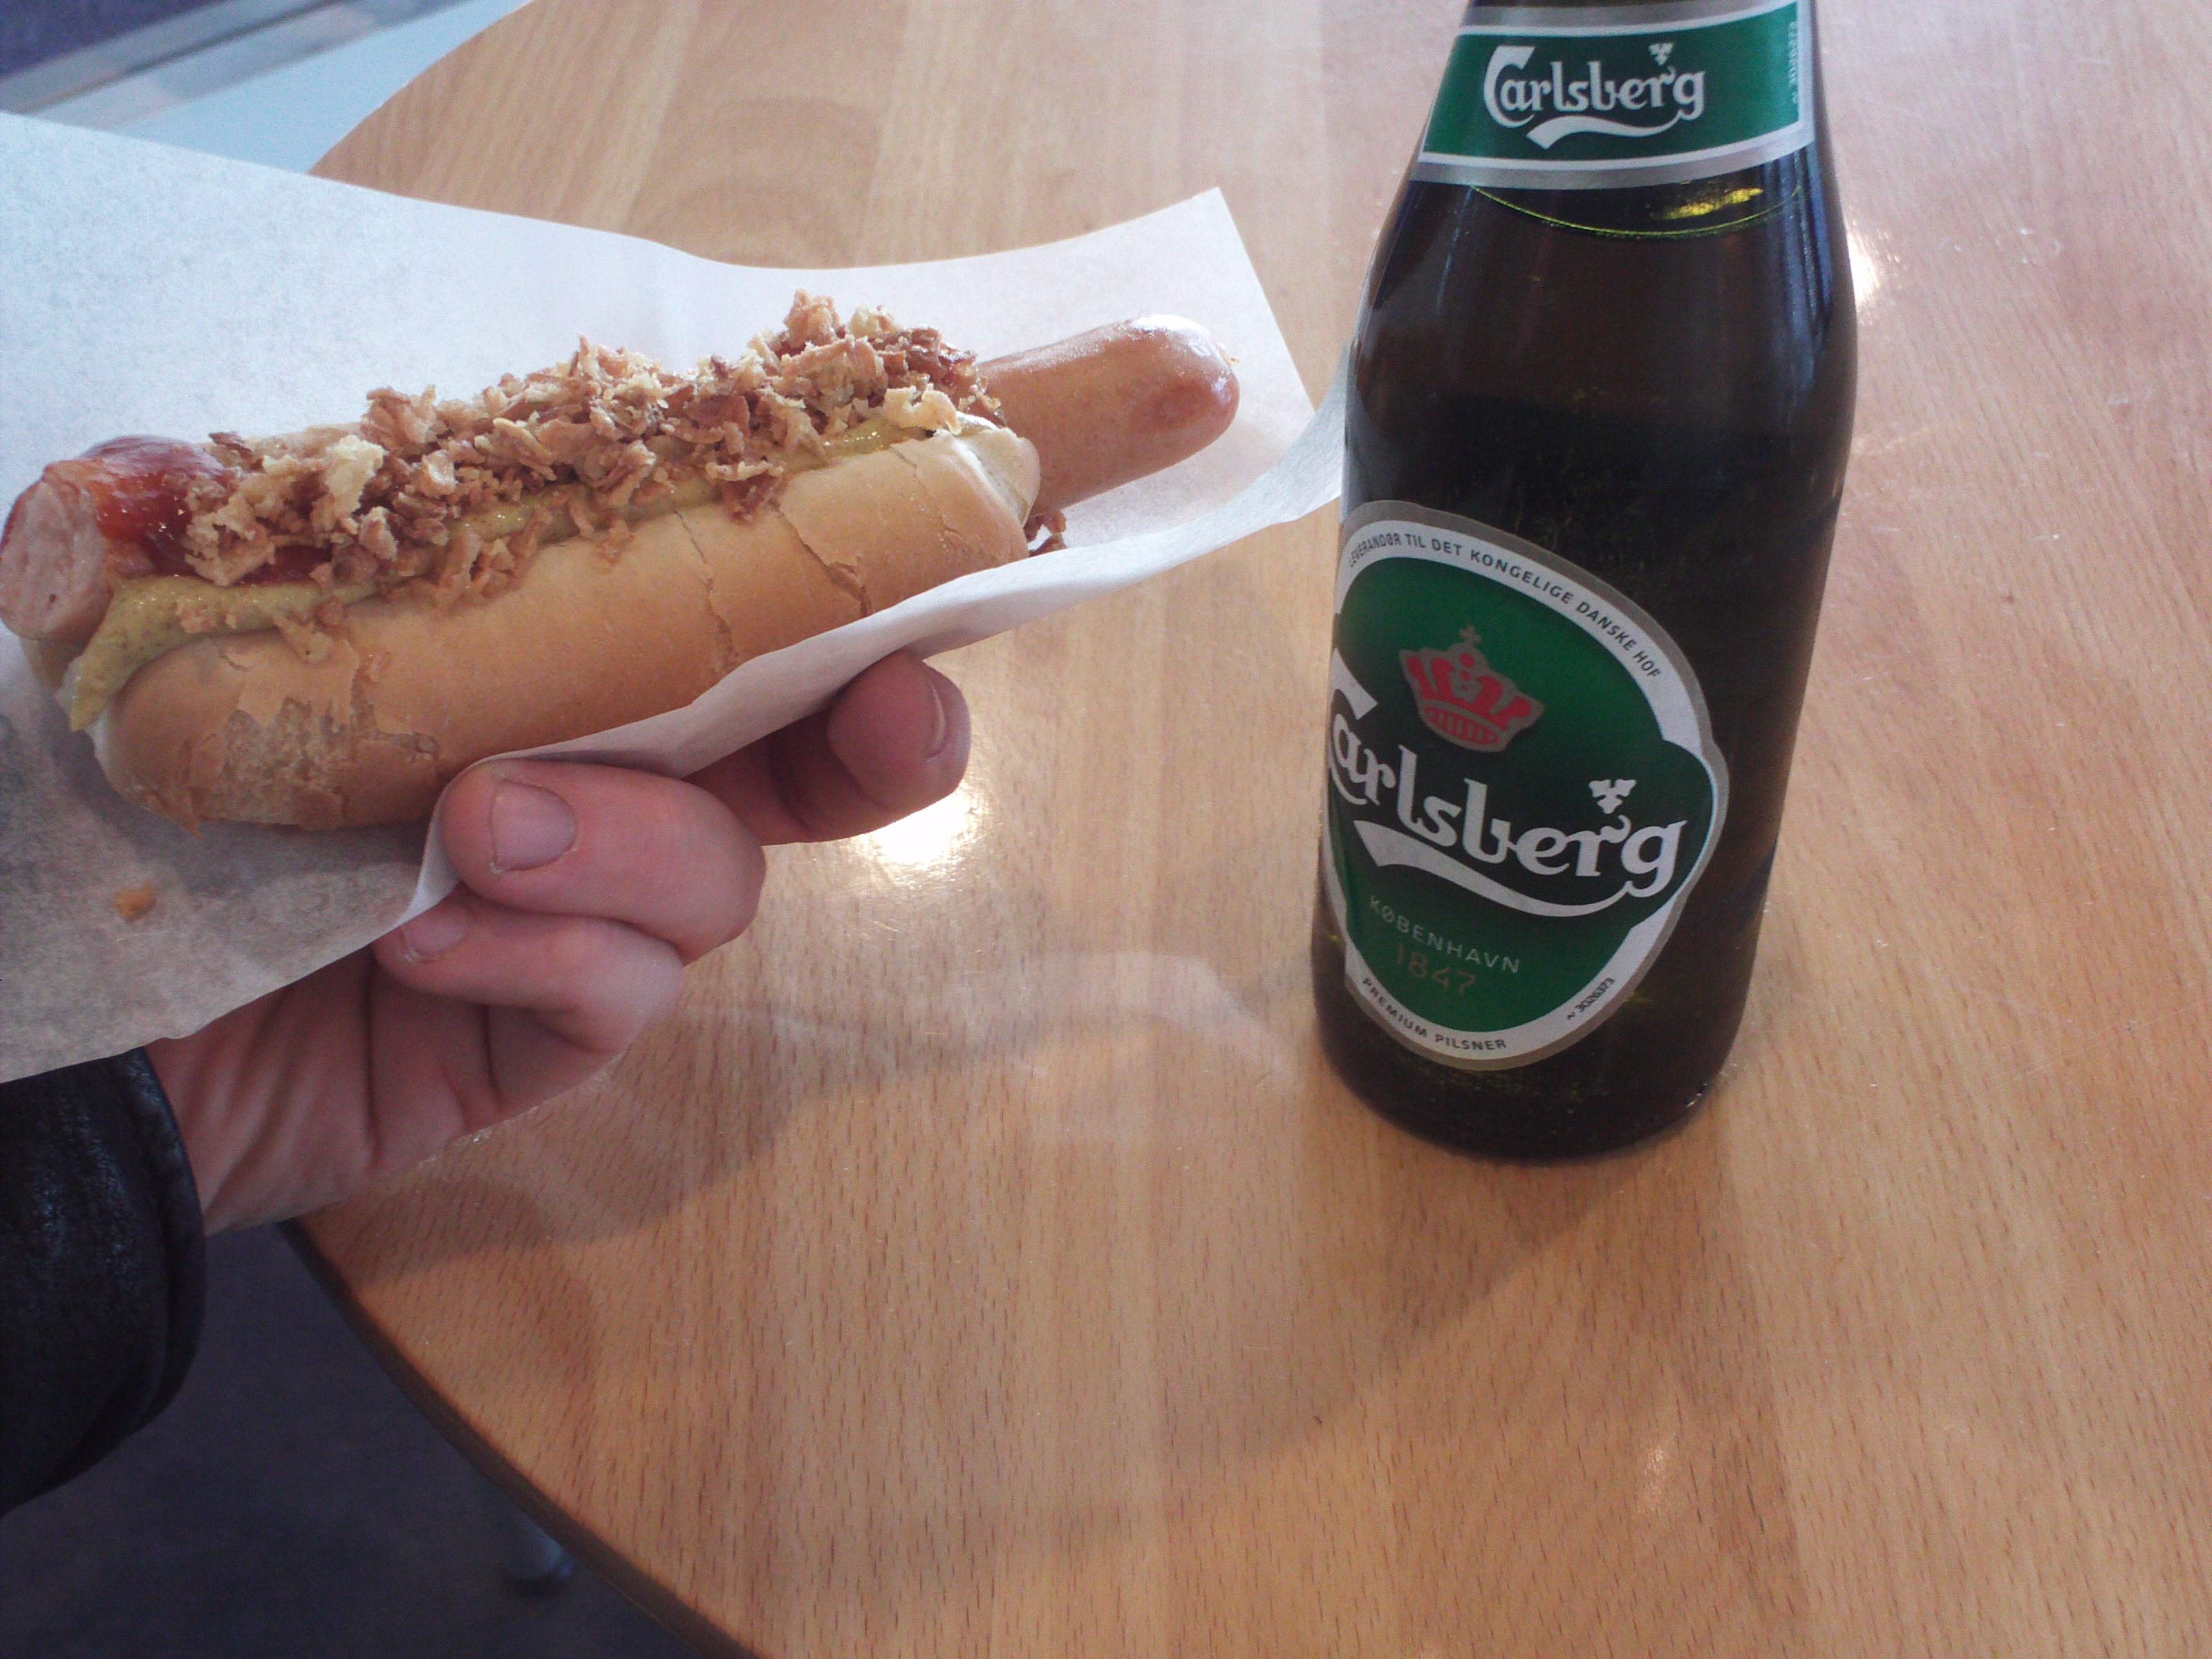 file danish hot dog and beer at copenhagen airport jpg wikimedia commons. Black Bedroom Furniture Sets. Home Design Ideas